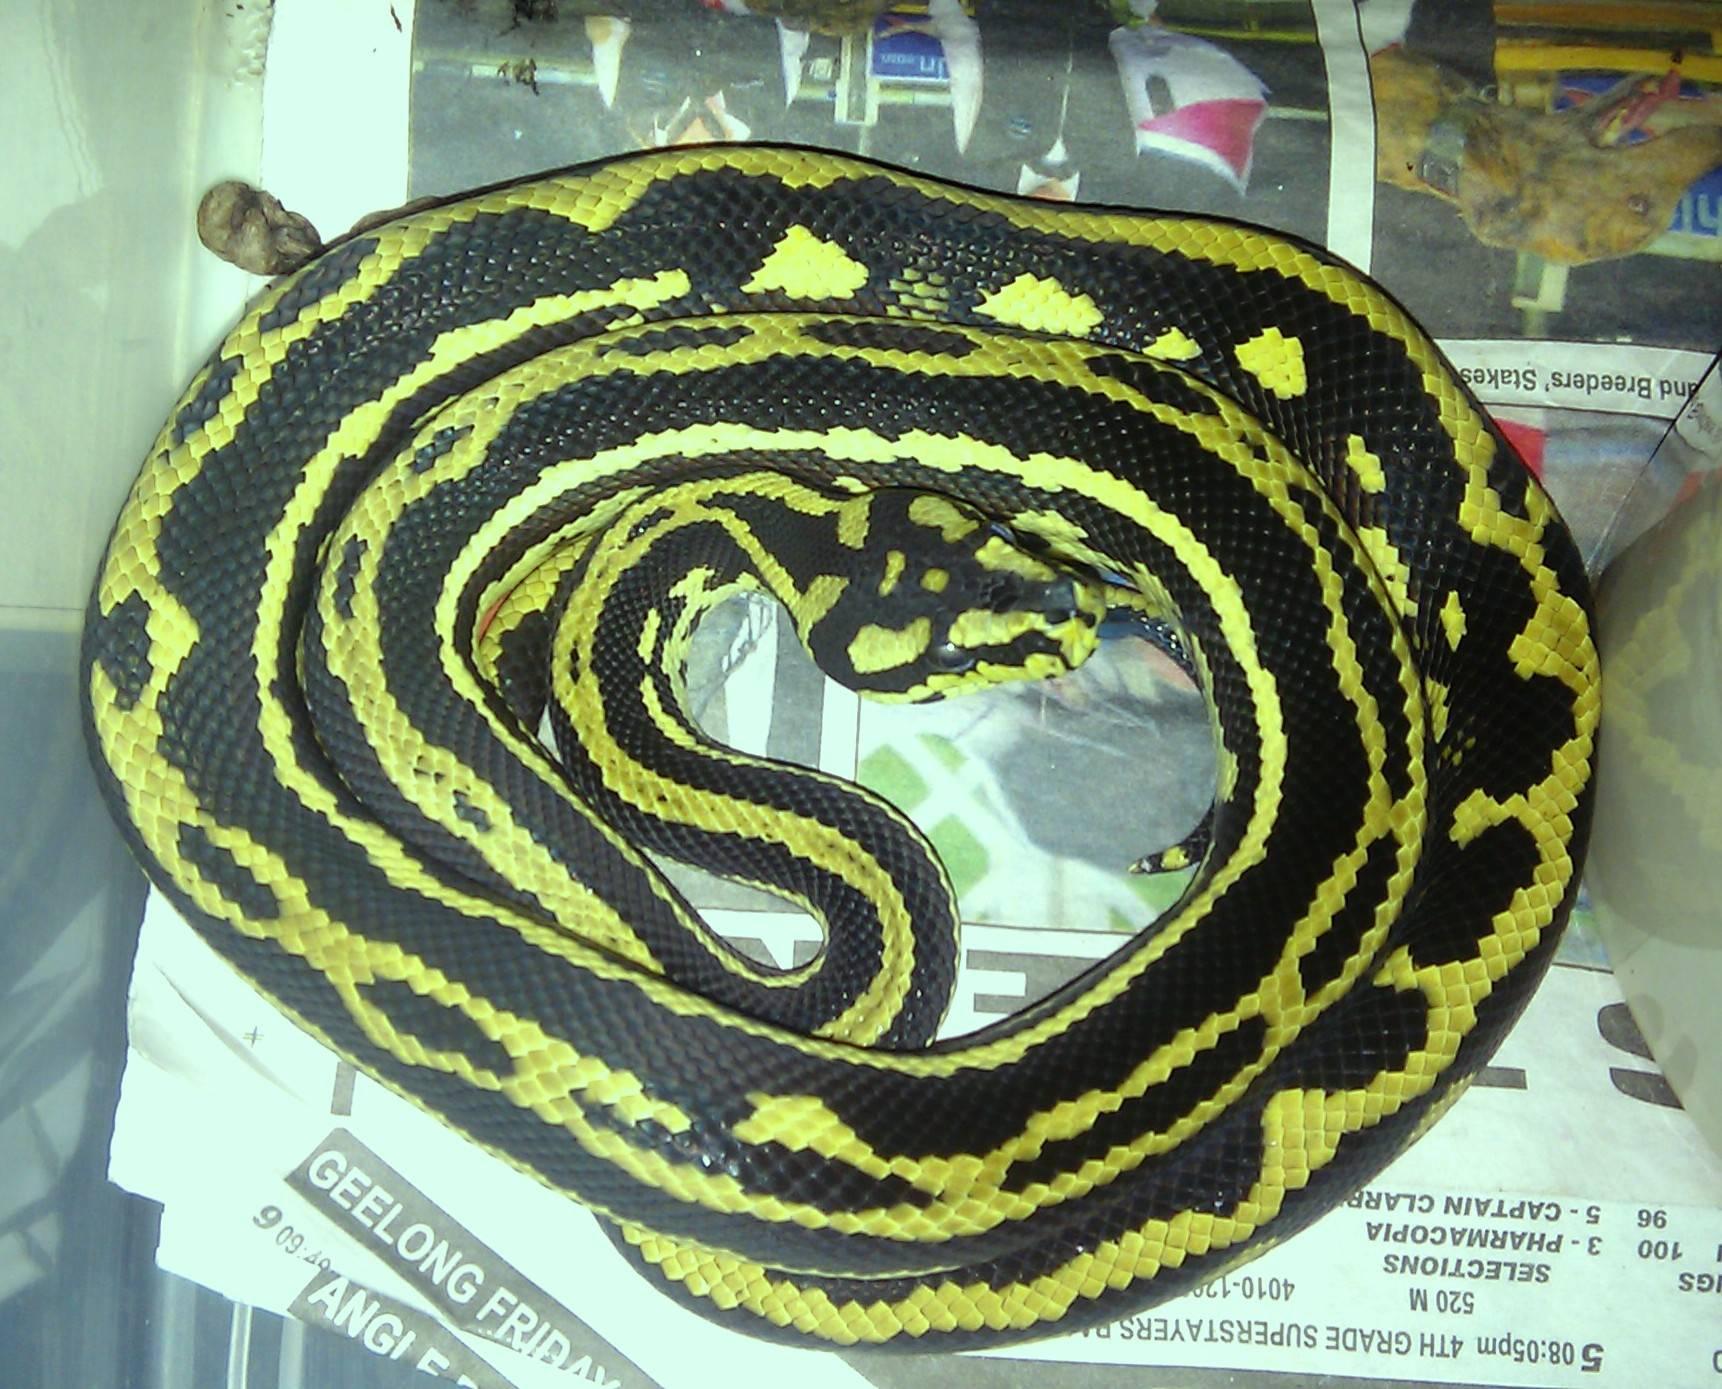 Jungle Carpet - Palmerston Striped male - hold back